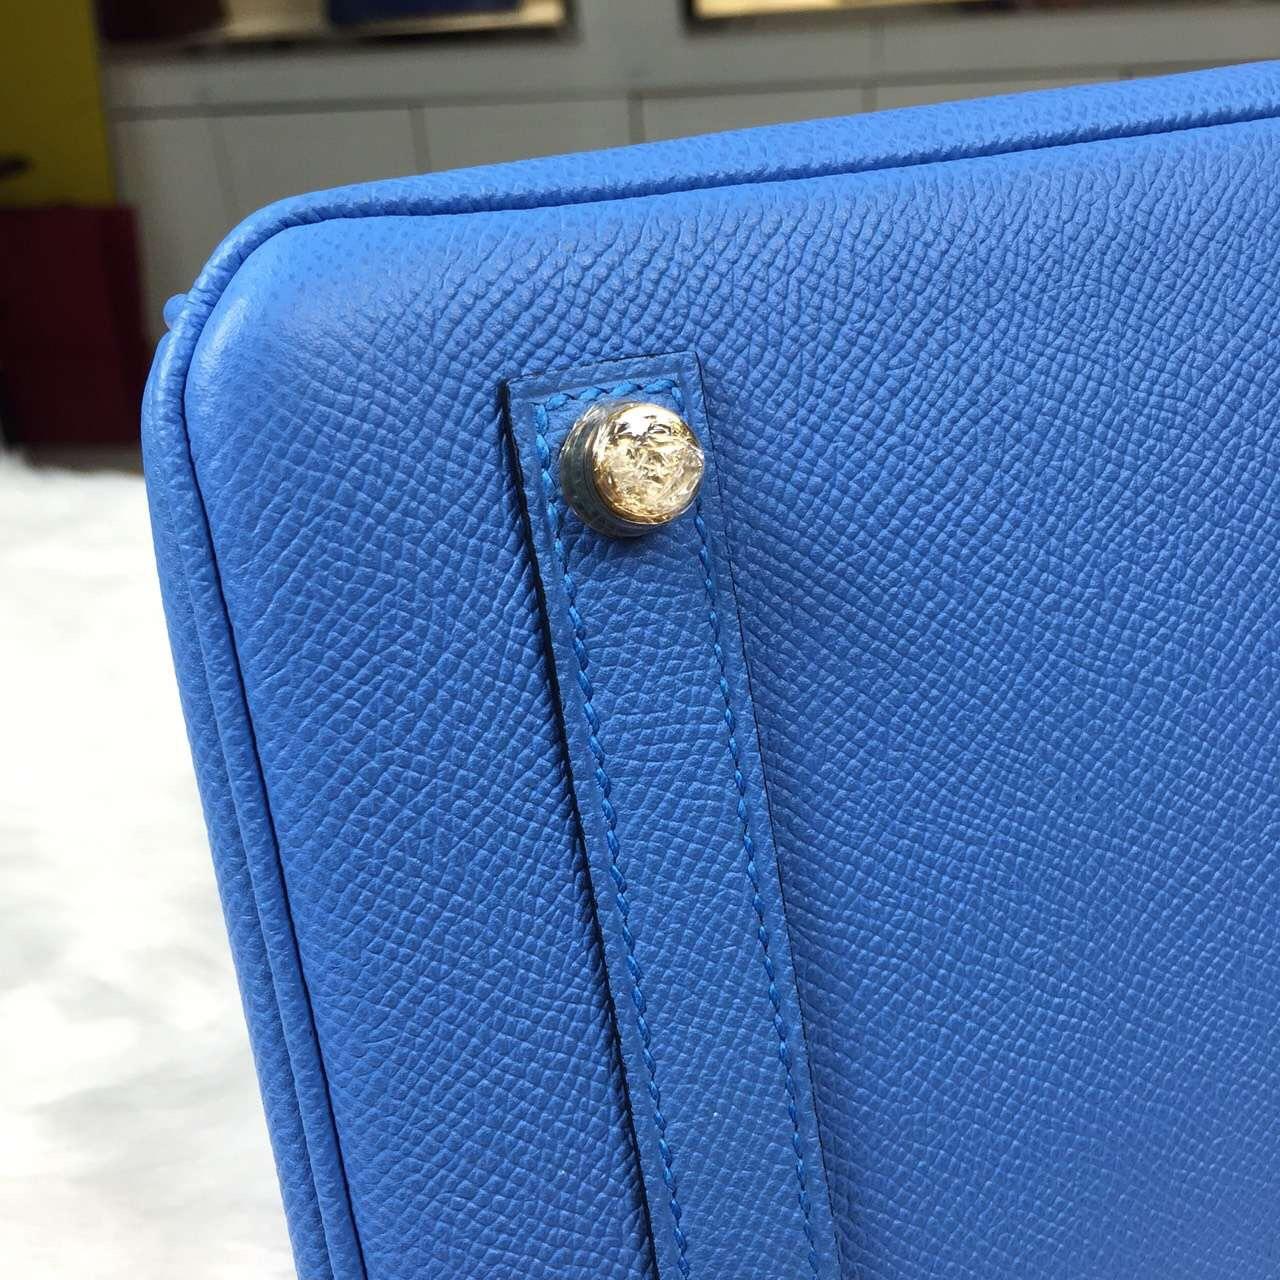 Luxury Bag Hermes Birkin 30CM 2T Blue Paradise Epsom Leather Women's Tote Bag